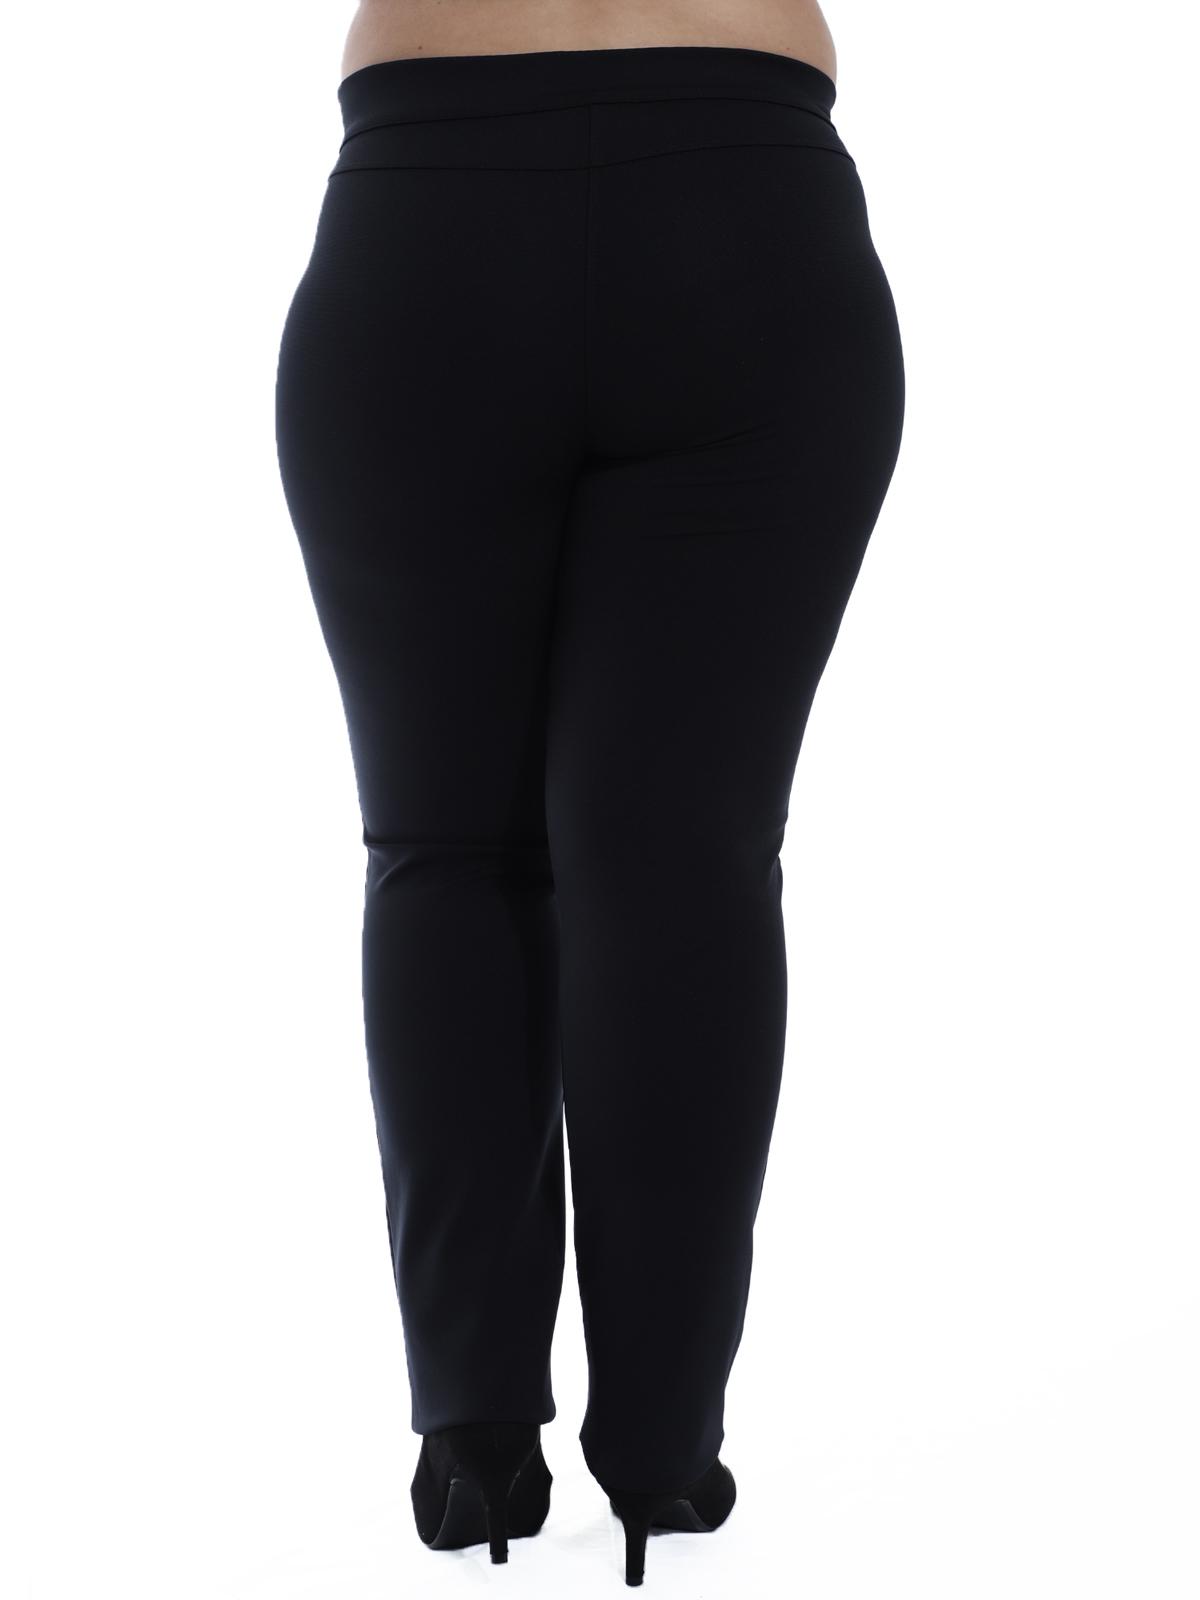 Calça Plus Size Feminina Body Fit Detalhe Lateral Preta